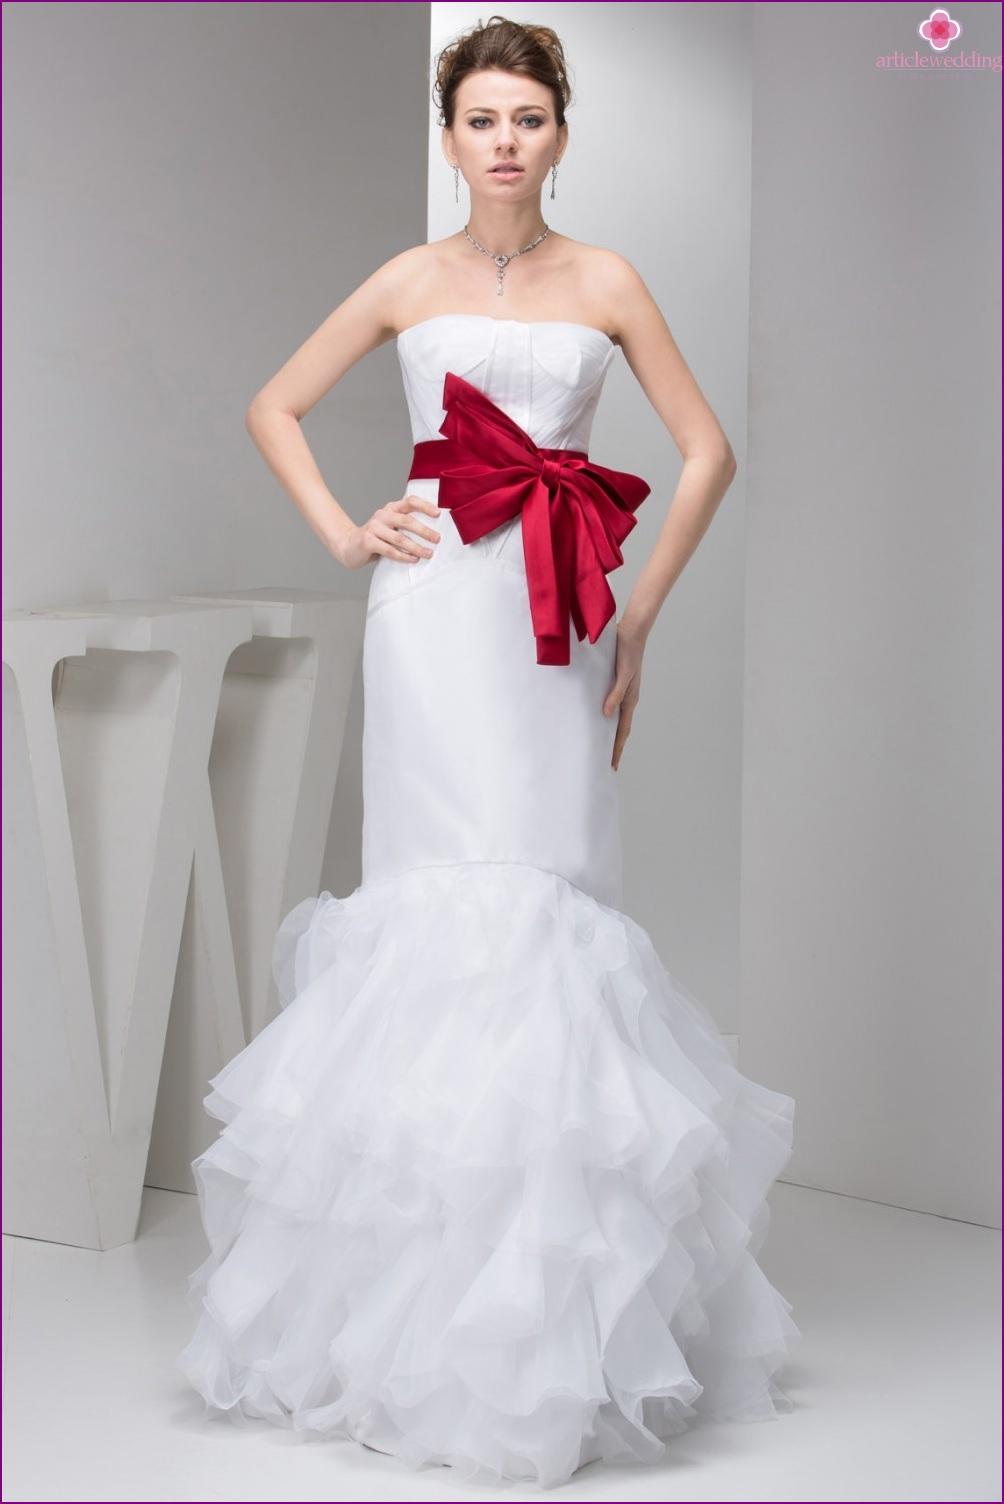 Bright belt on the dress